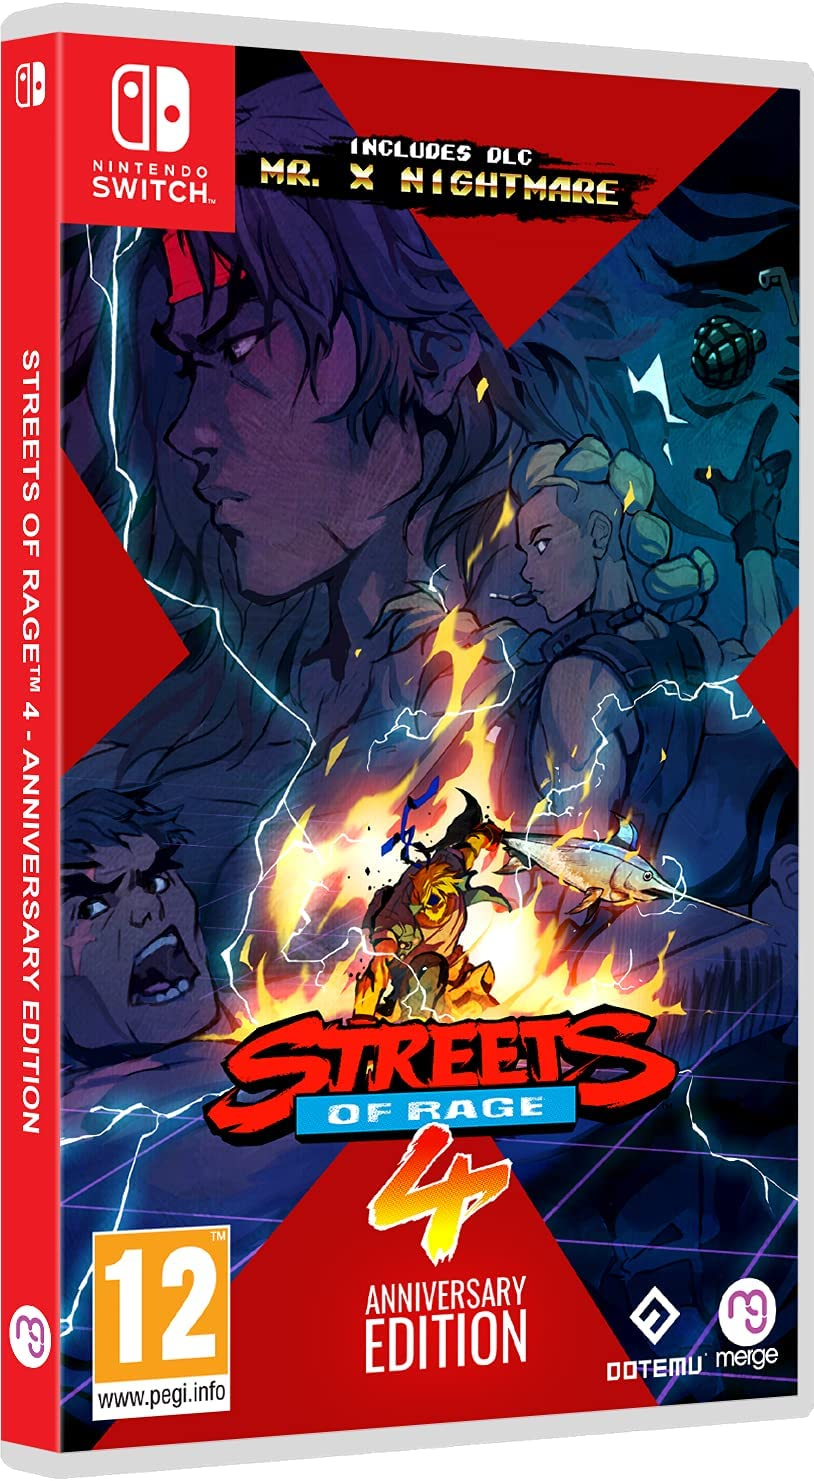 streets of rage 4 - Page 3 71zaHxOQwZS._AC_SL1482_